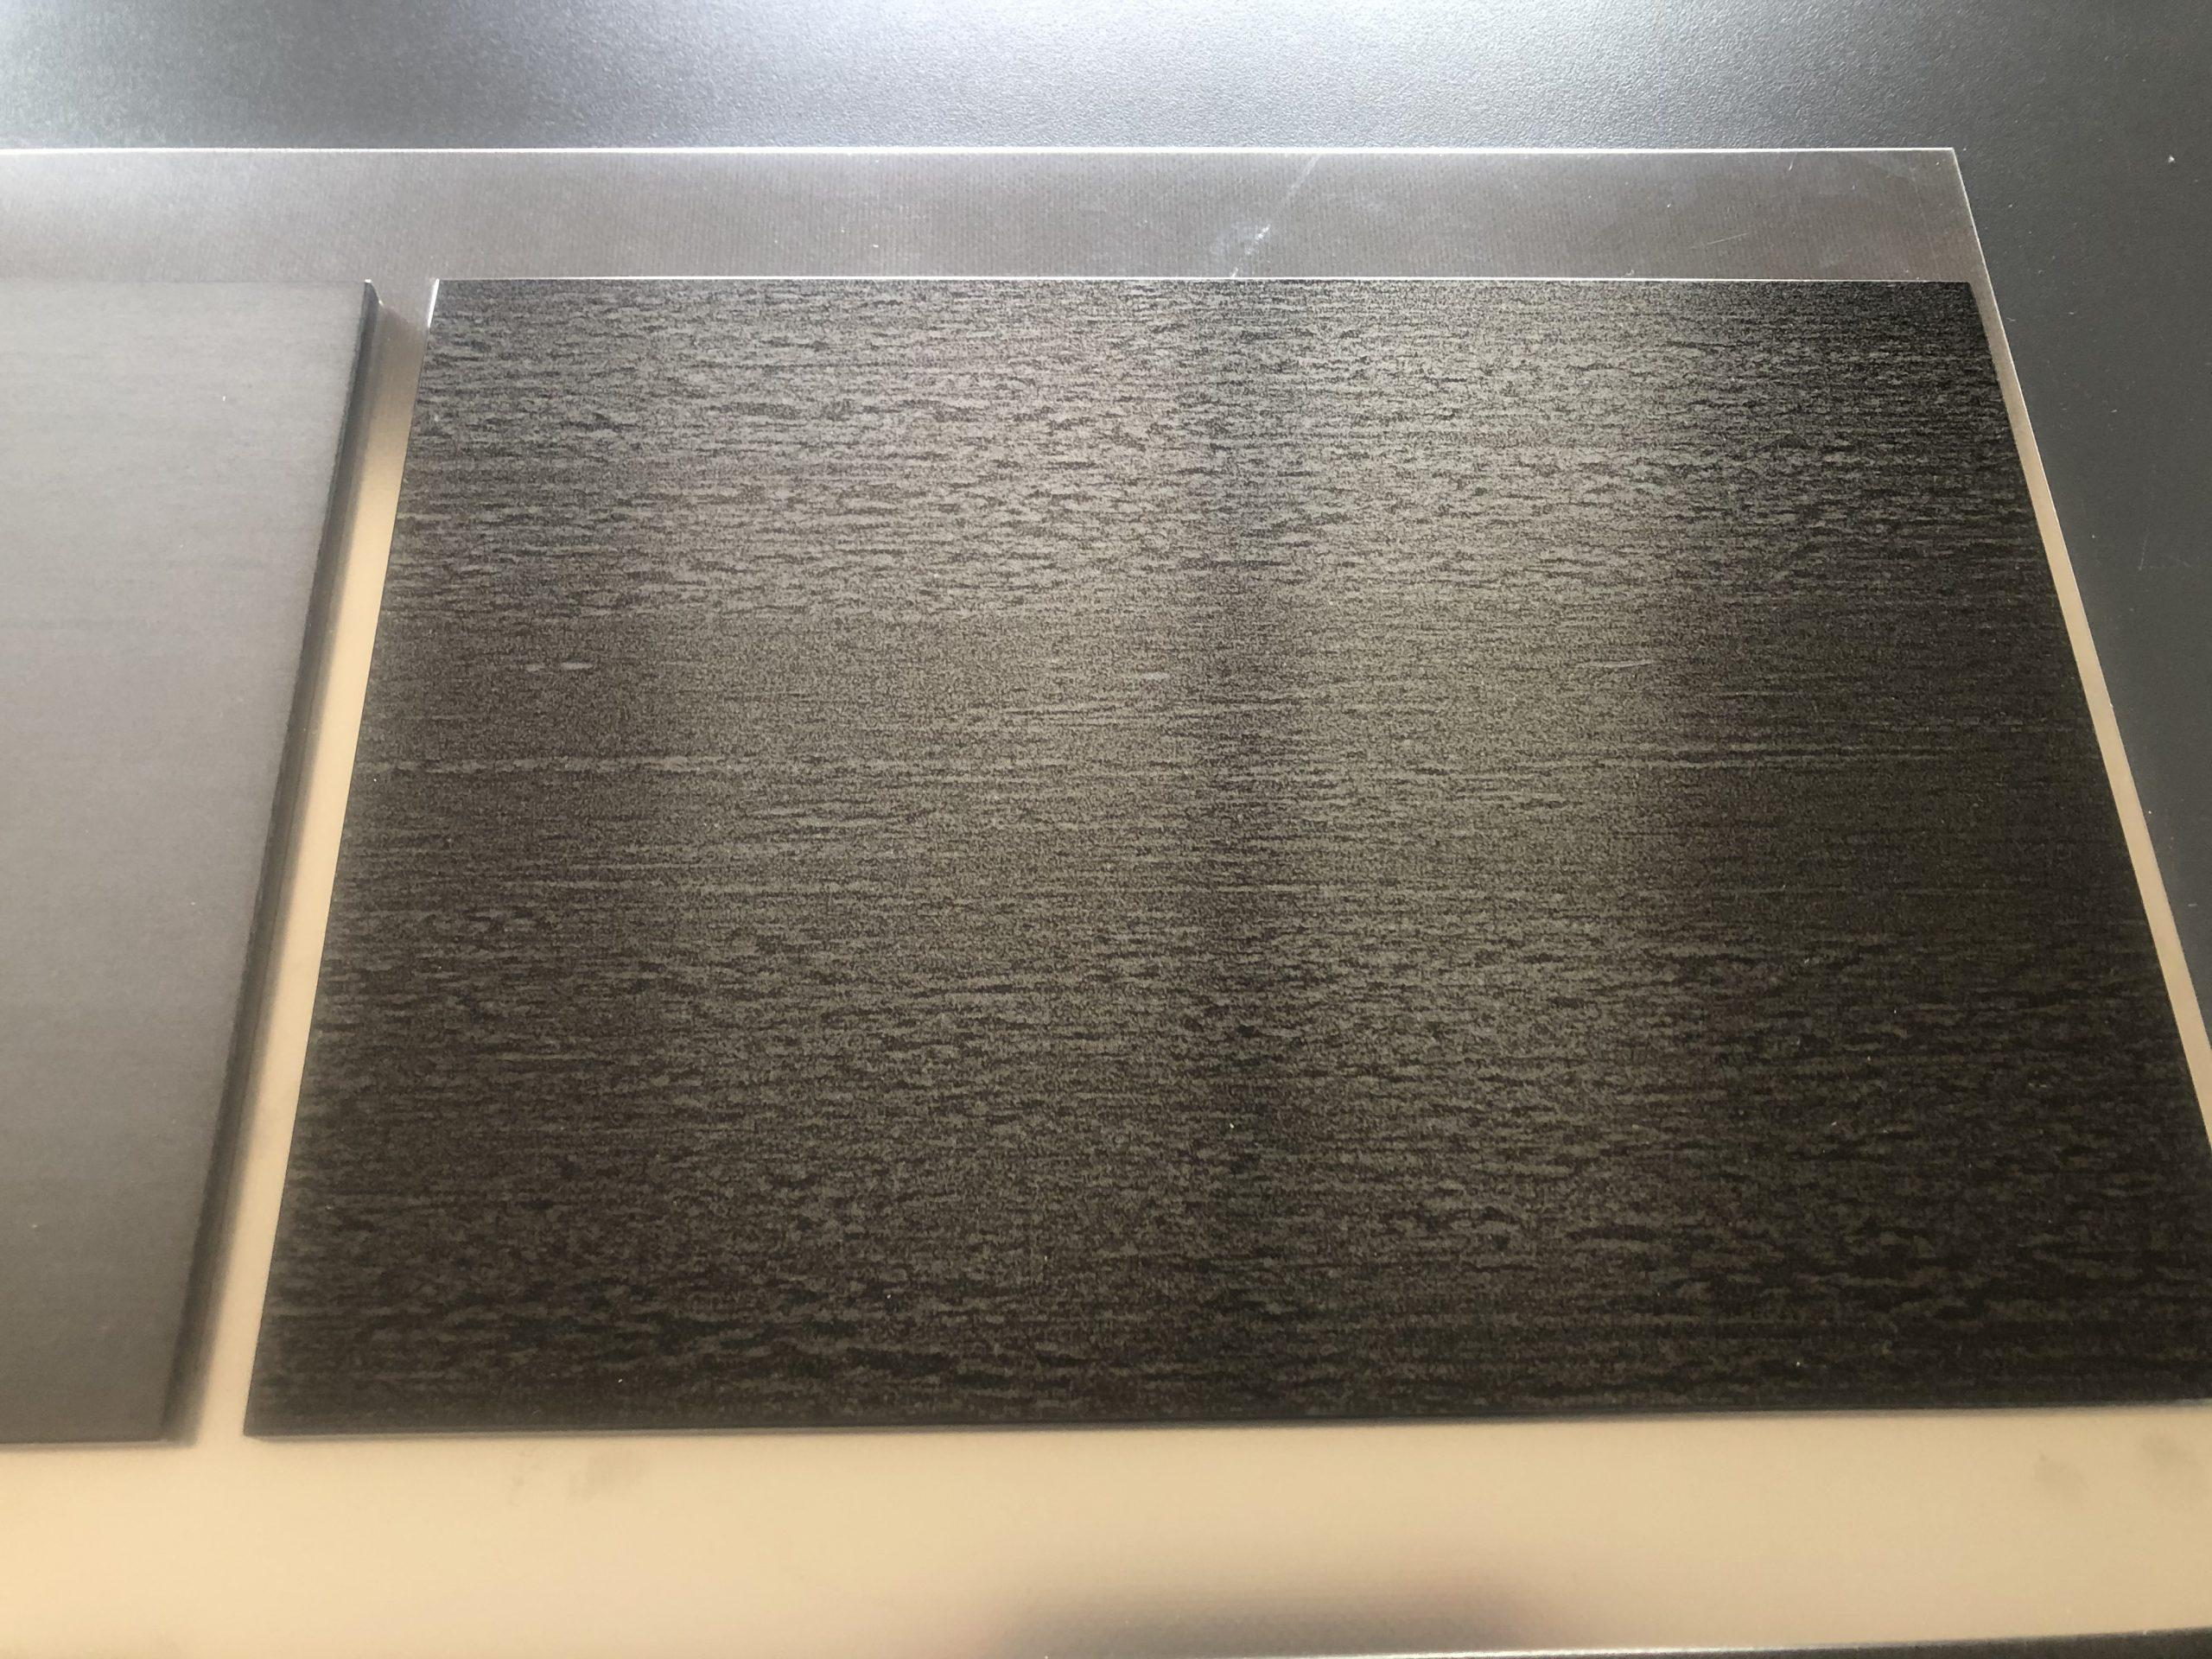 Warmgewalzt NanoINOX black edelstahl